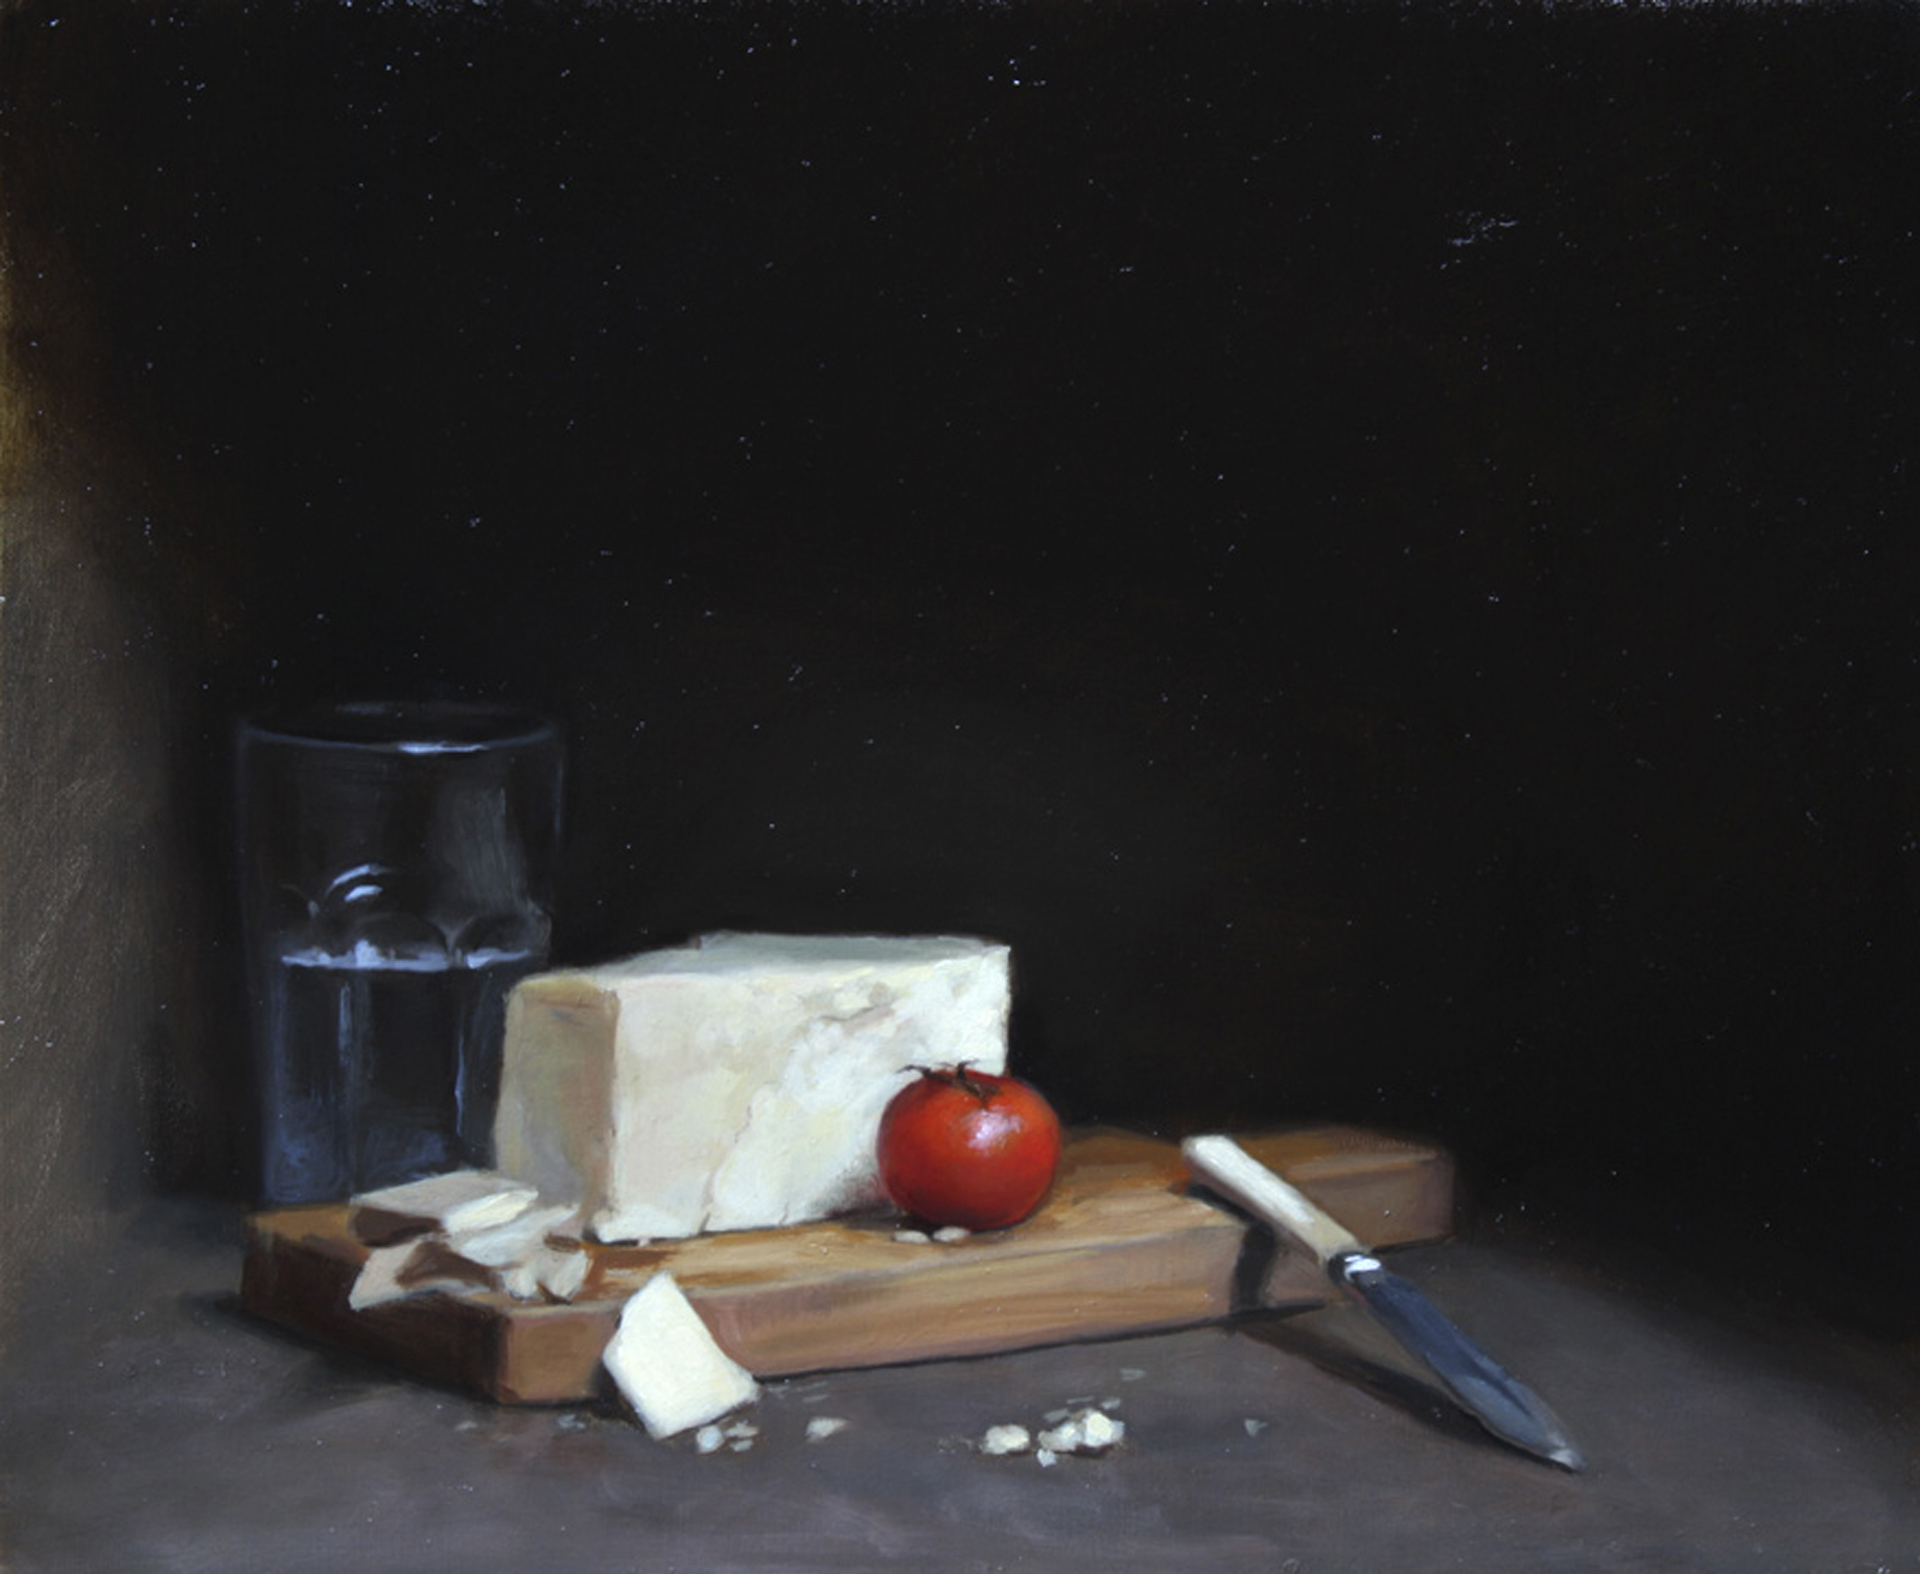 The Cheese.jpg